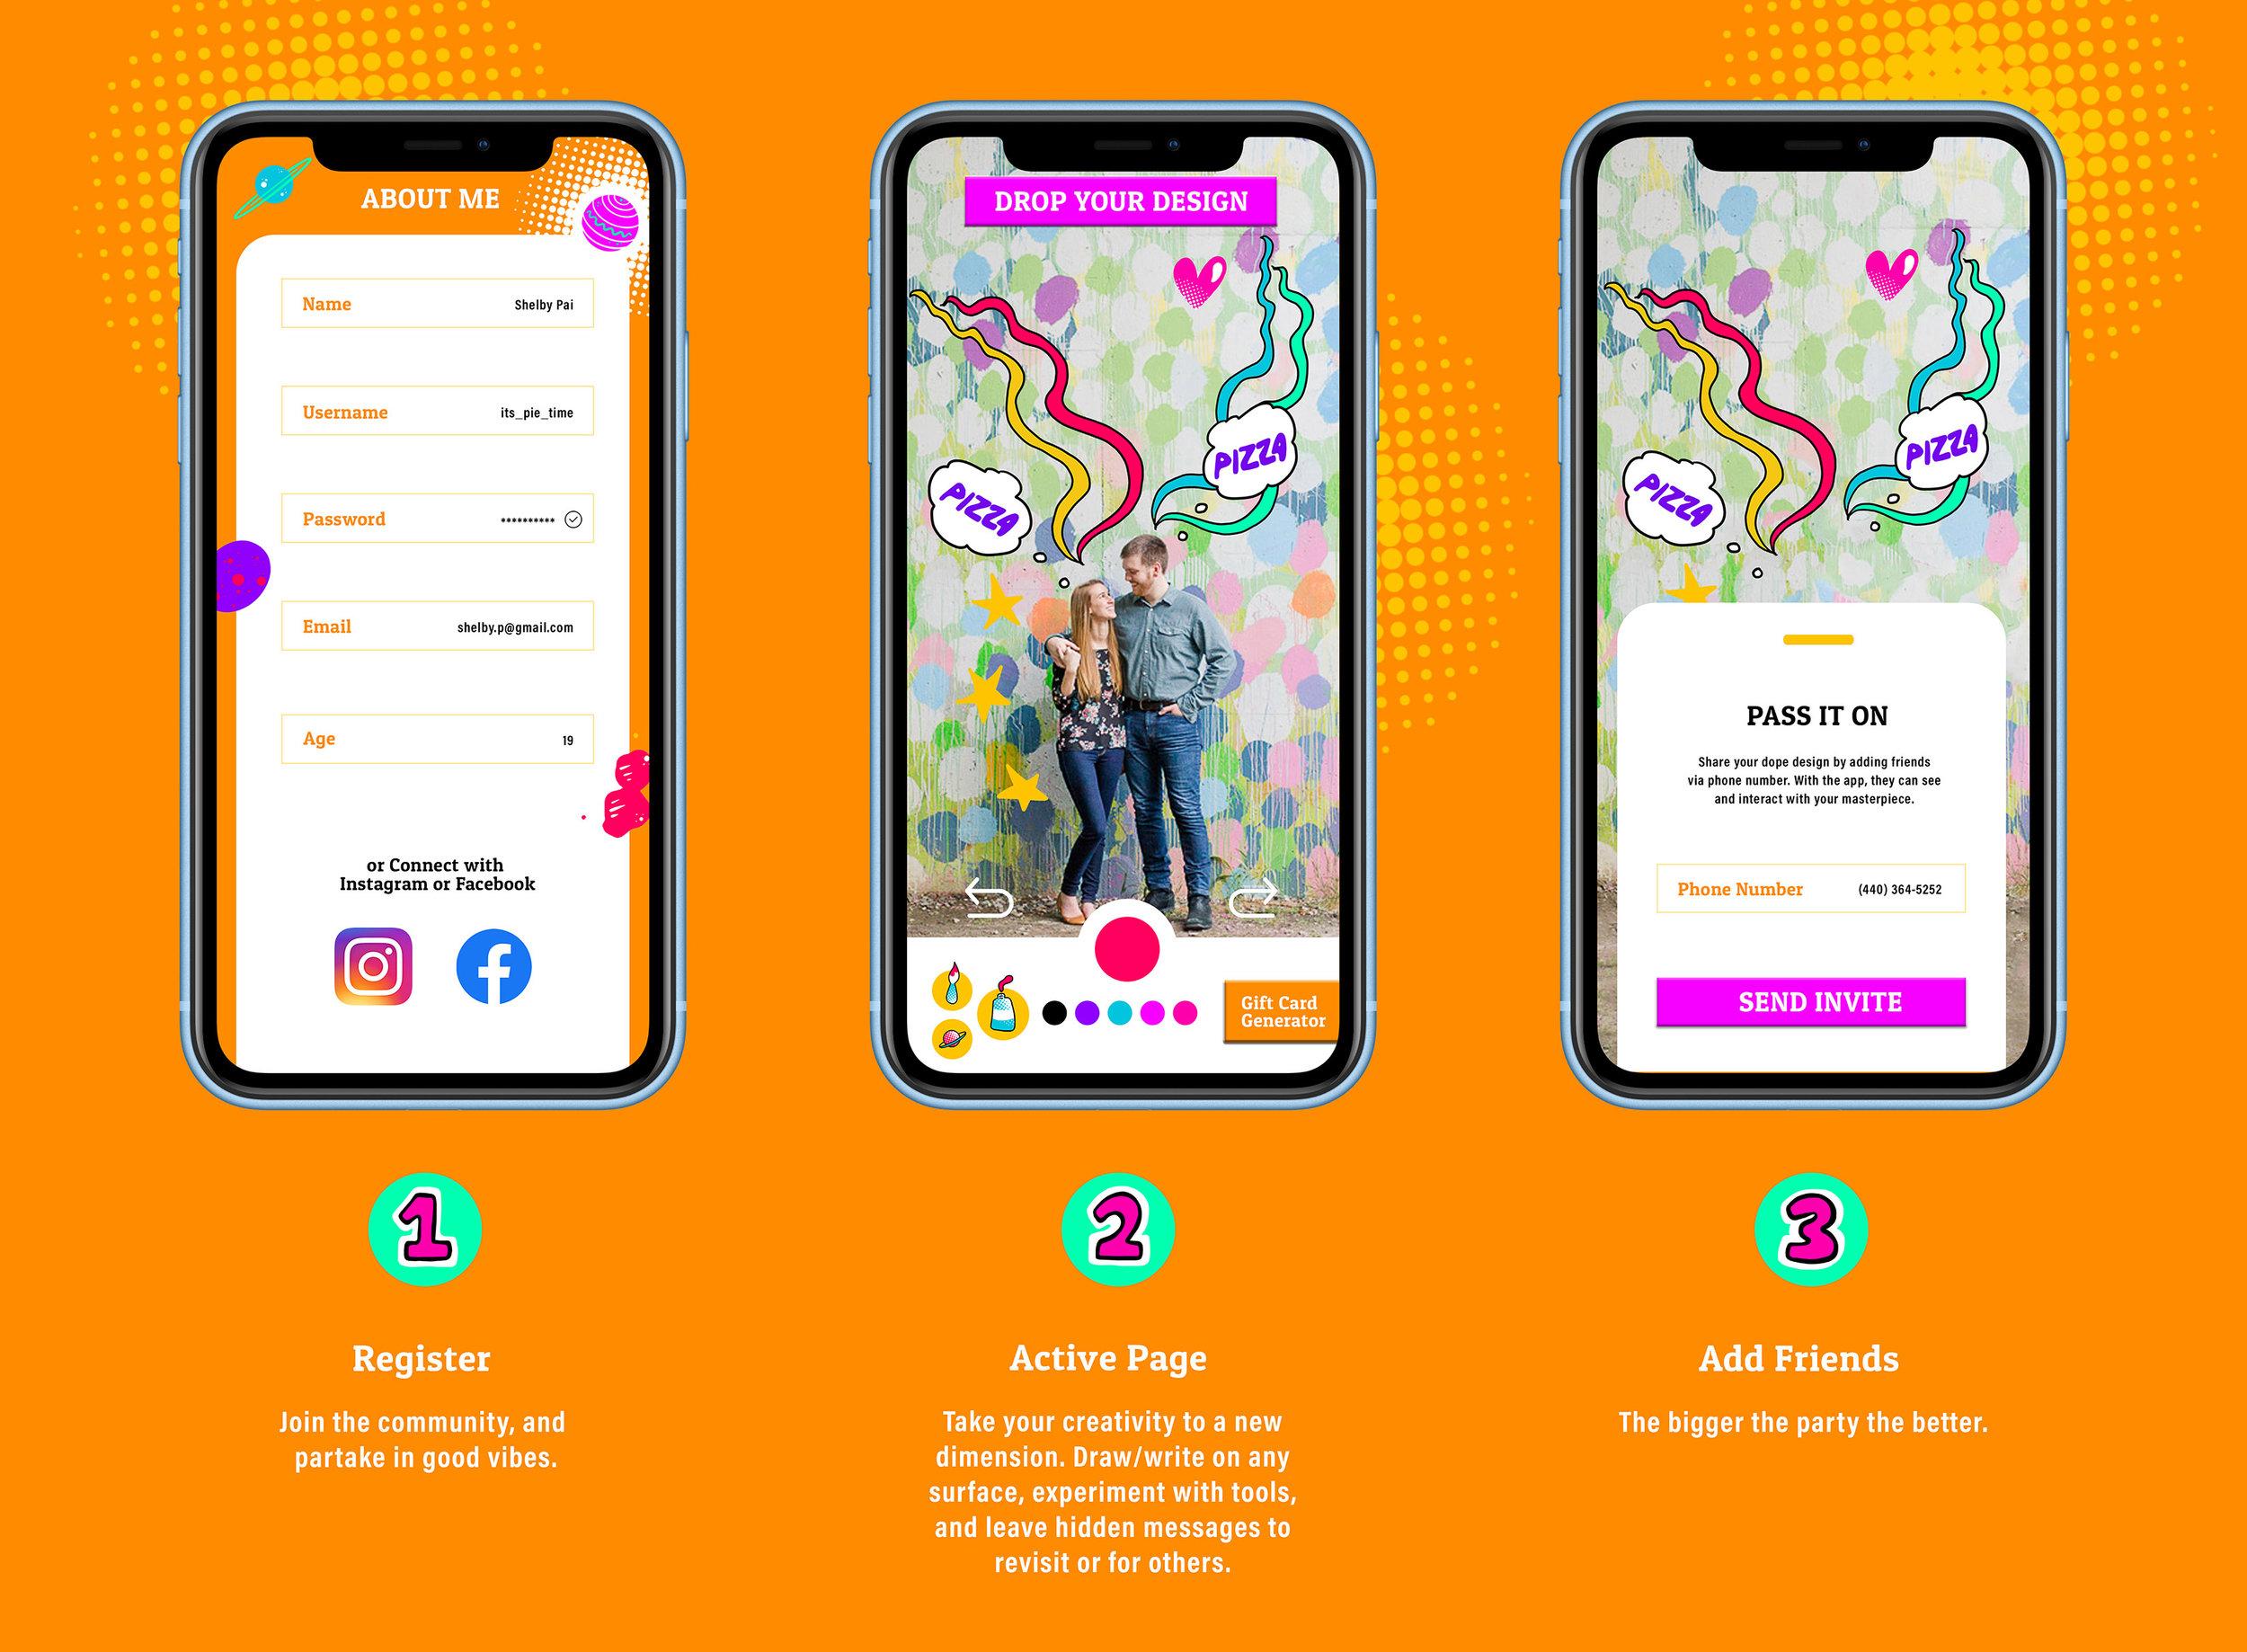 mellow phone screen 1-3.jpg